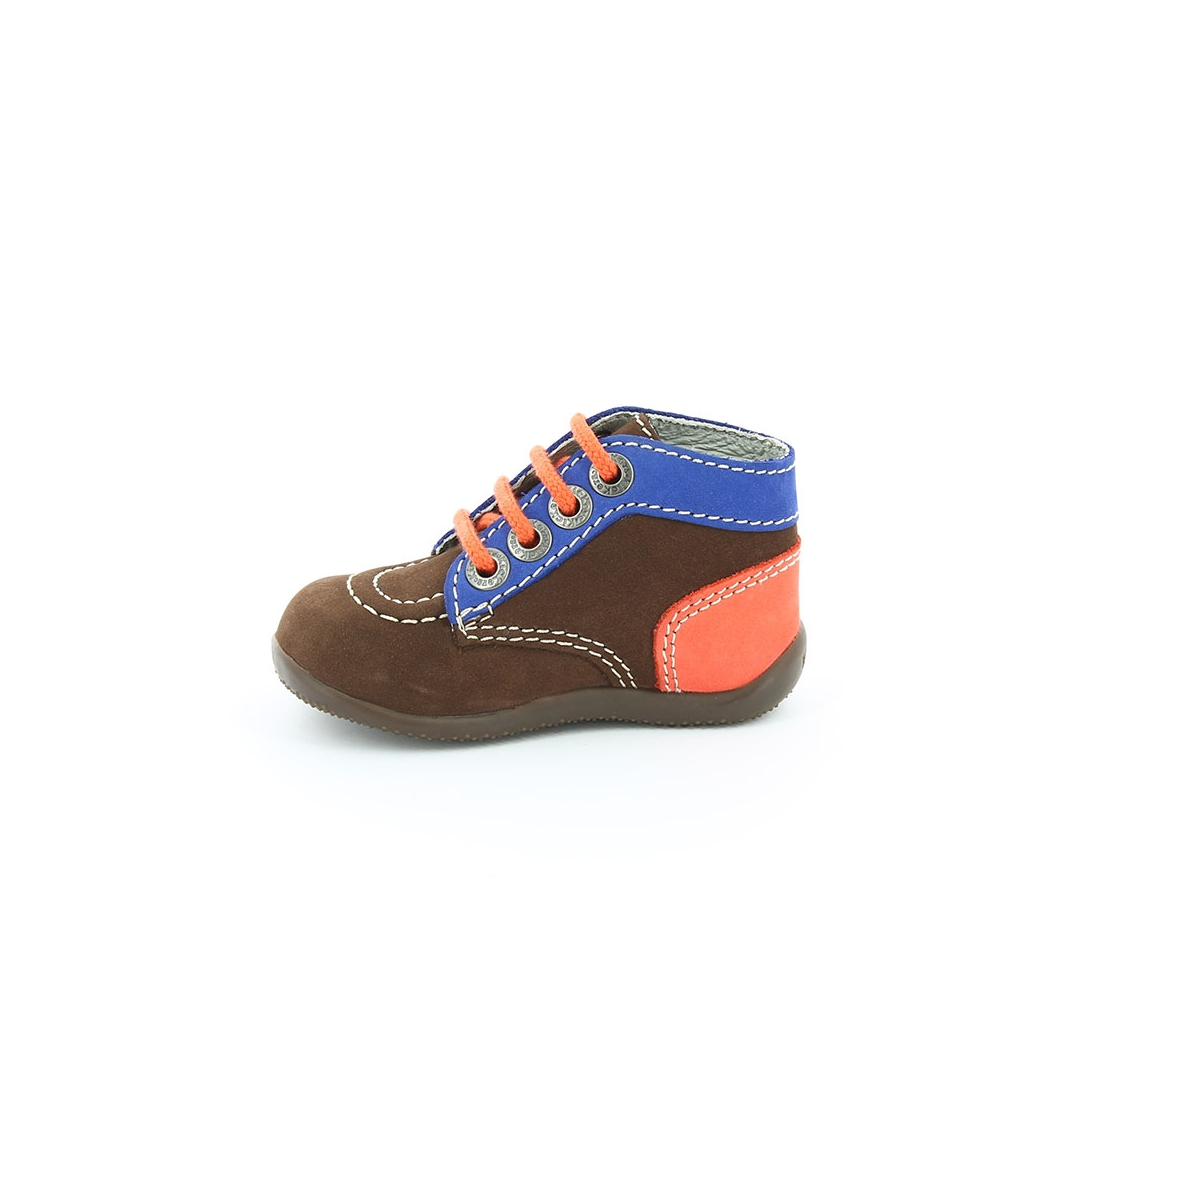 kickers bonbon marron fonce bleu orange bottillons b b kickers officiel. Black Bedroom Furniture Sets. Home Design Ideas